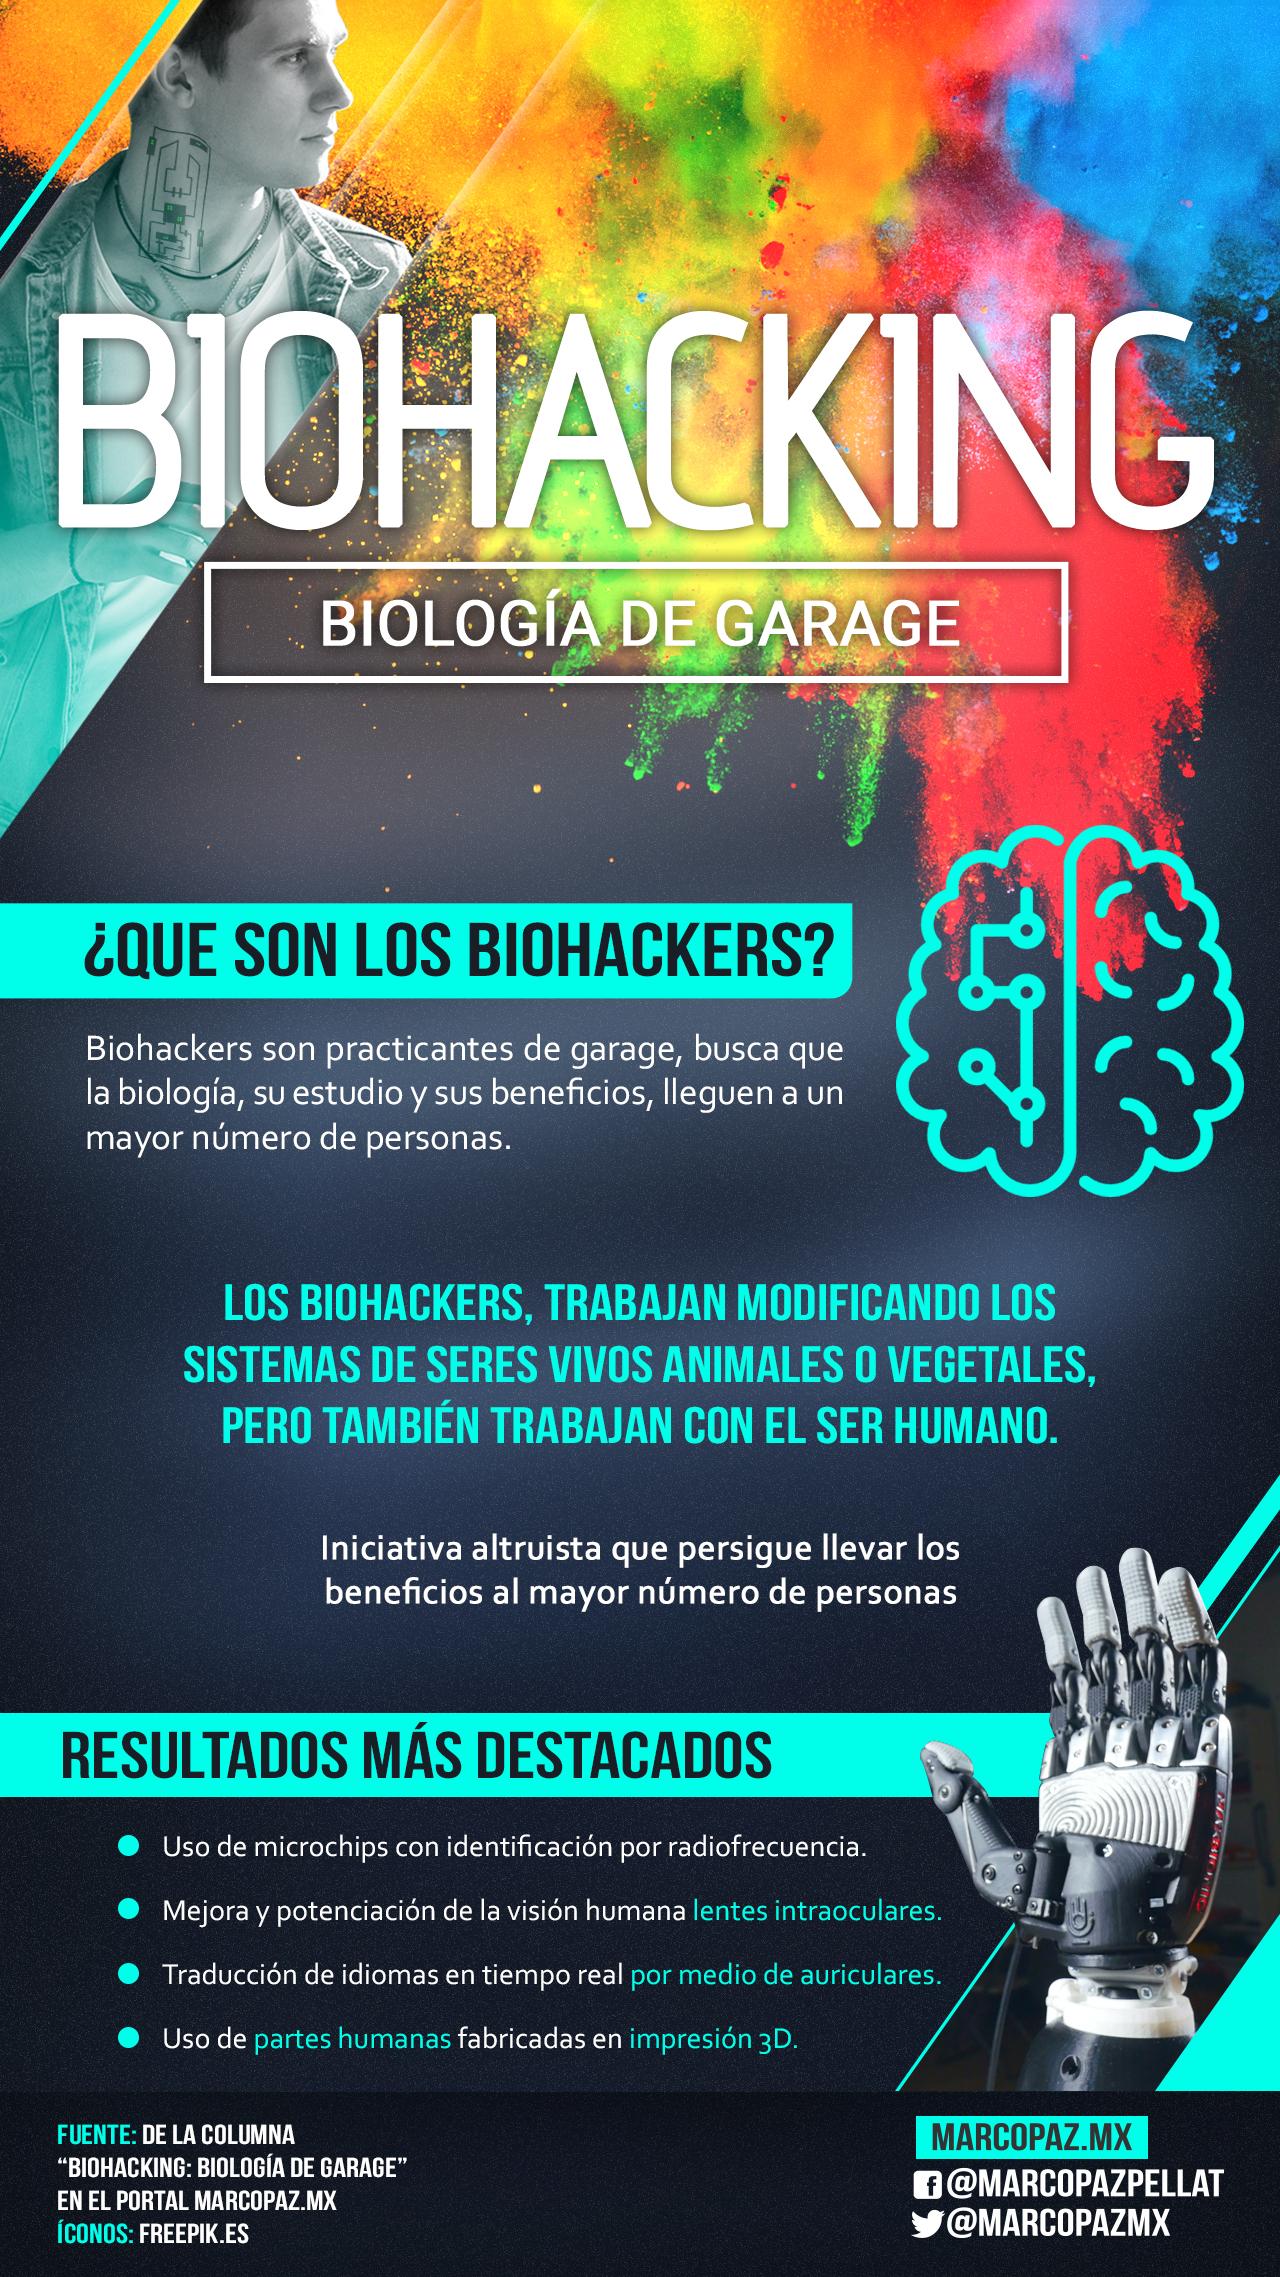 02_INFOGRAFIA_Biohacking_biología_de_garage